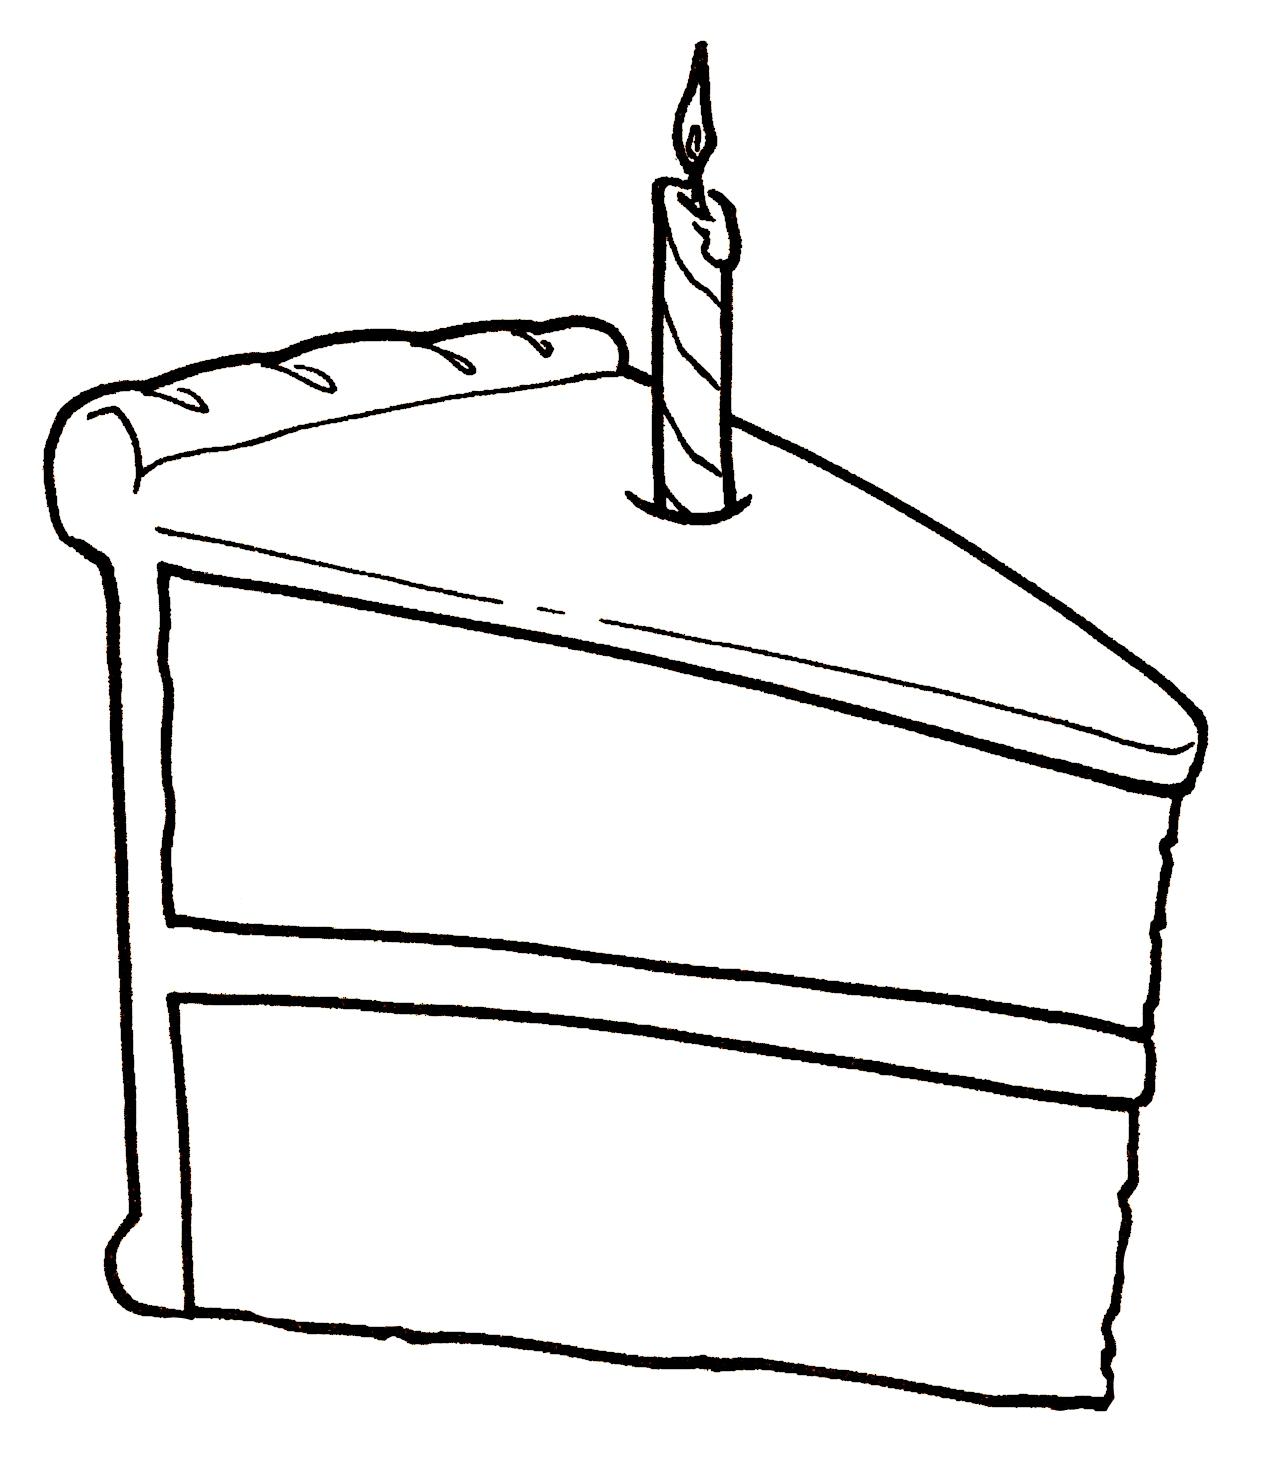 Drawn cake cake slice Cake slice netart chocolate cake